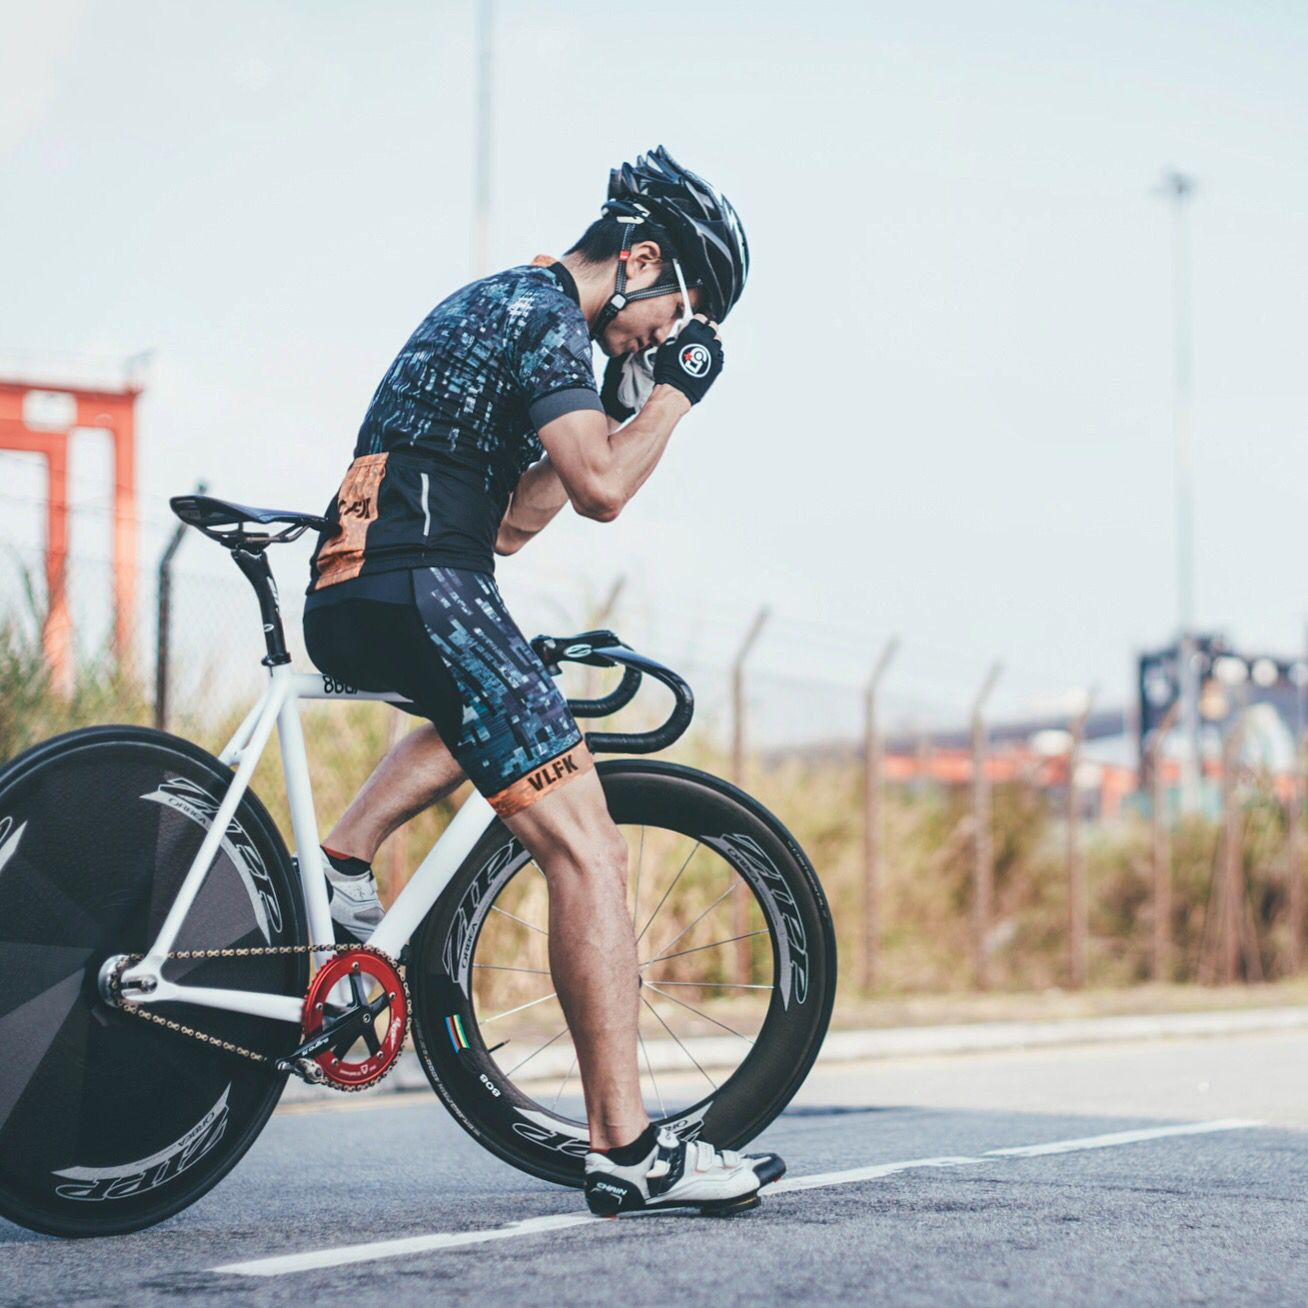 Pin De Velofreak Cycling En Velofreak Gears Estilo Caballero